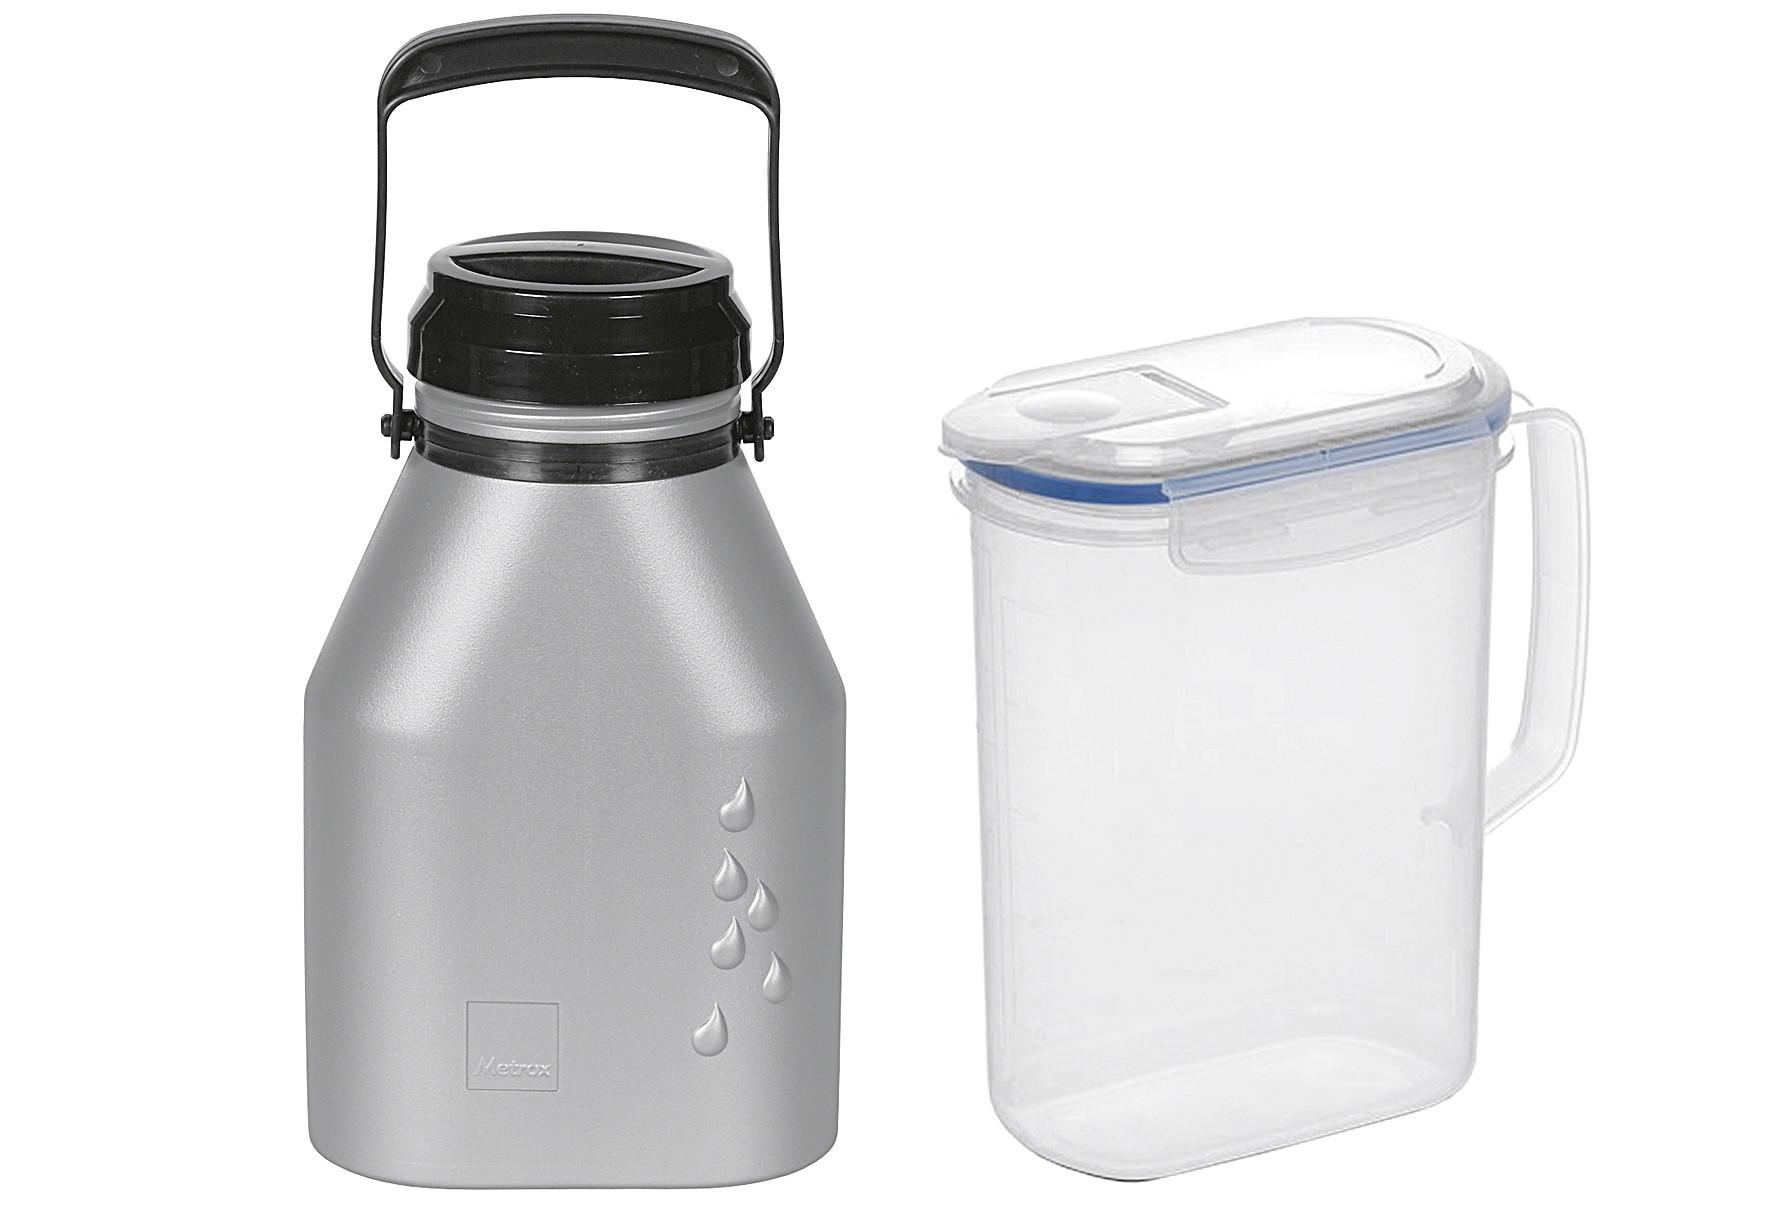 Kühlschrankkanne : Emsa kühlschrankkanne c c l